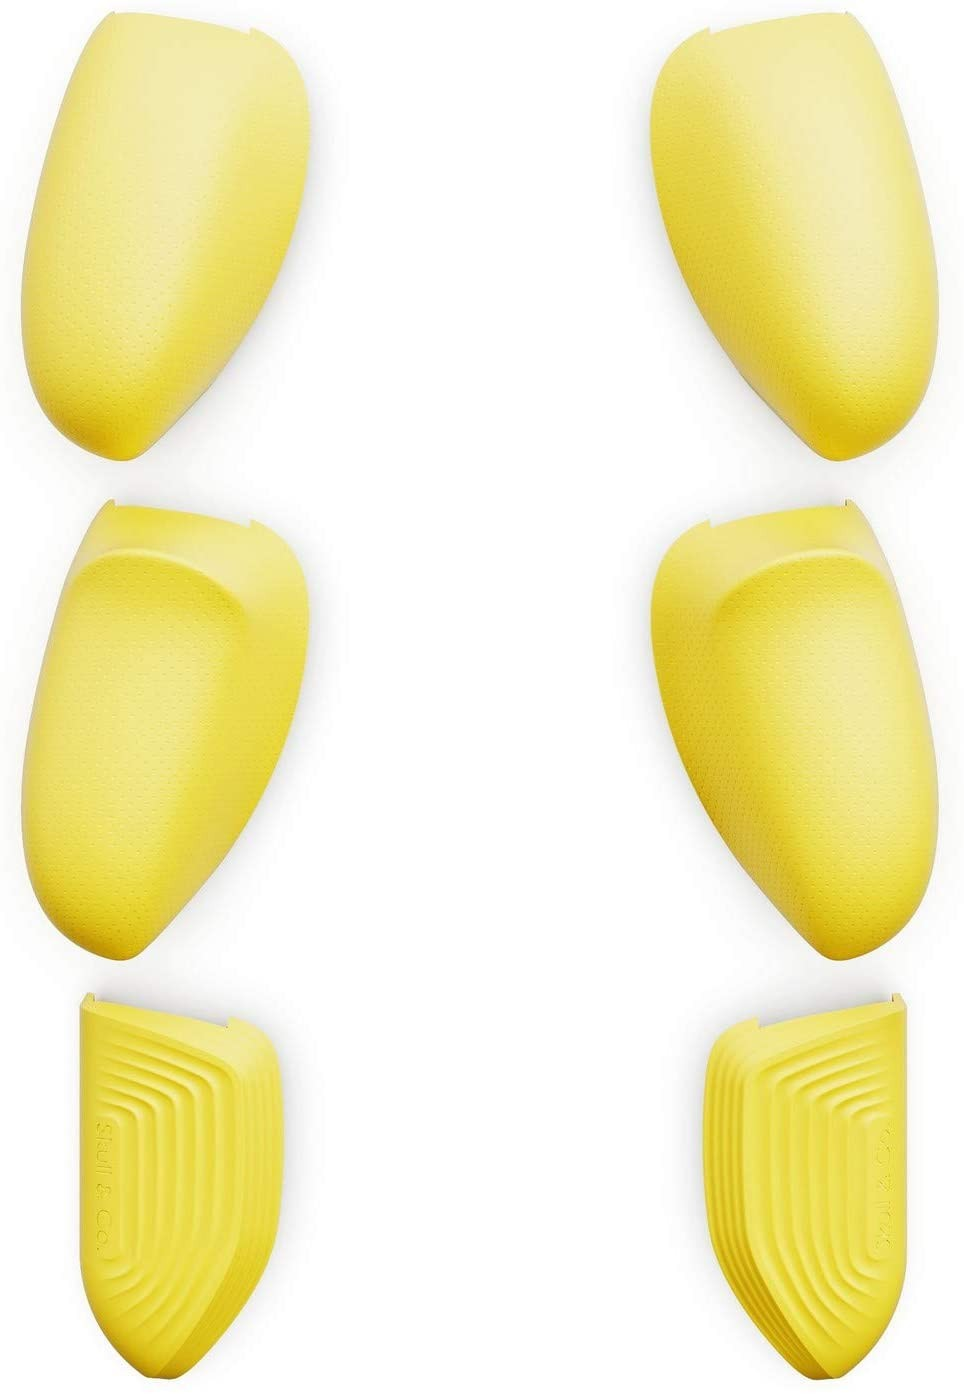 Змінні накладки-рукоятки Skull & Co. Interchangeable Lite Grip Set for GripCase Lite: Snap/Trigger/Plus Grips для SWITCH Lite Жовтий